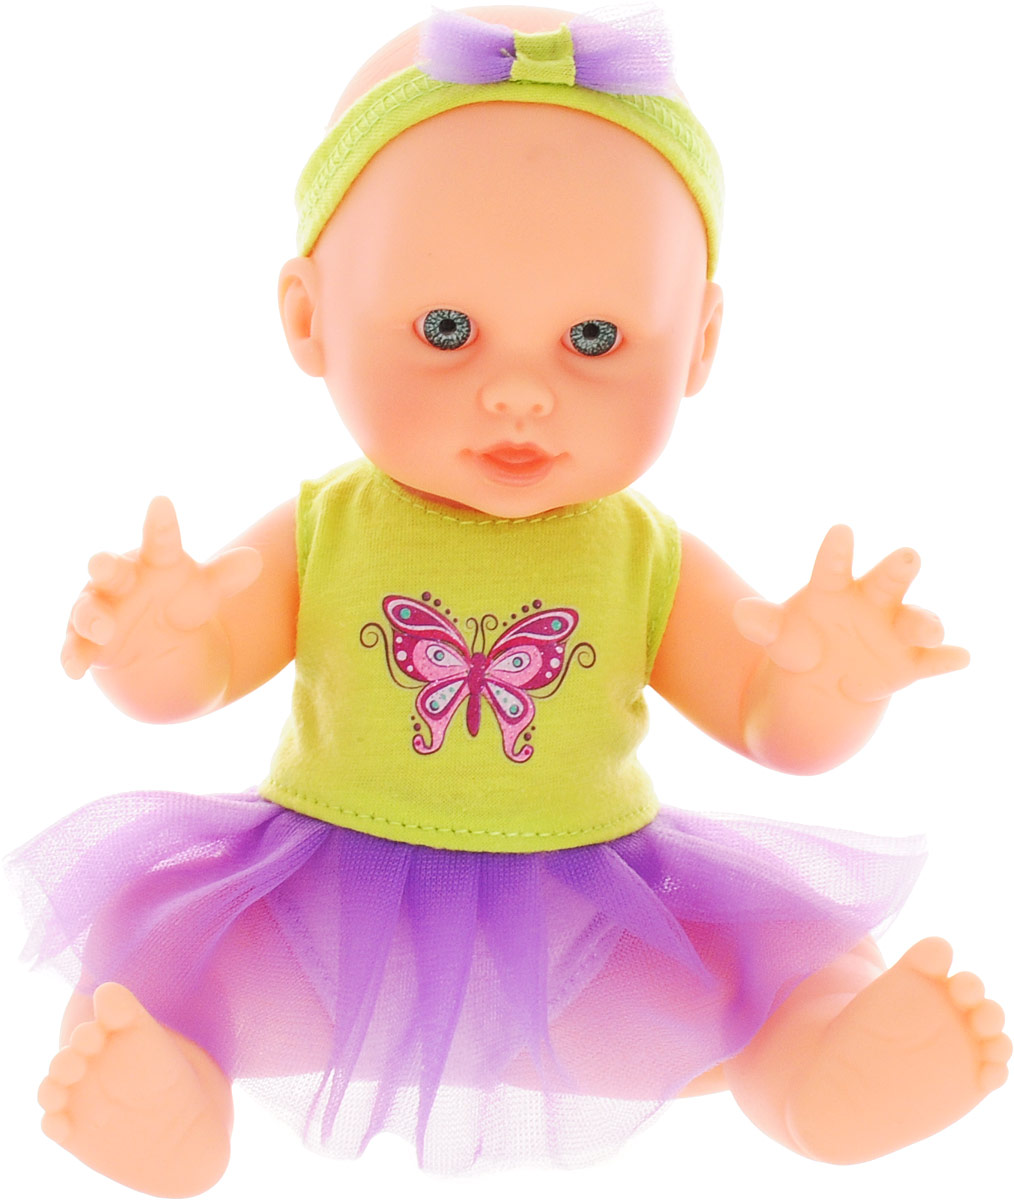 Mary Poppins Пупс Милли-балеринка цвет одежды зеленый фиолетовый mary poppins одежда для куклы 42 см боди mary poppins в ассортименте